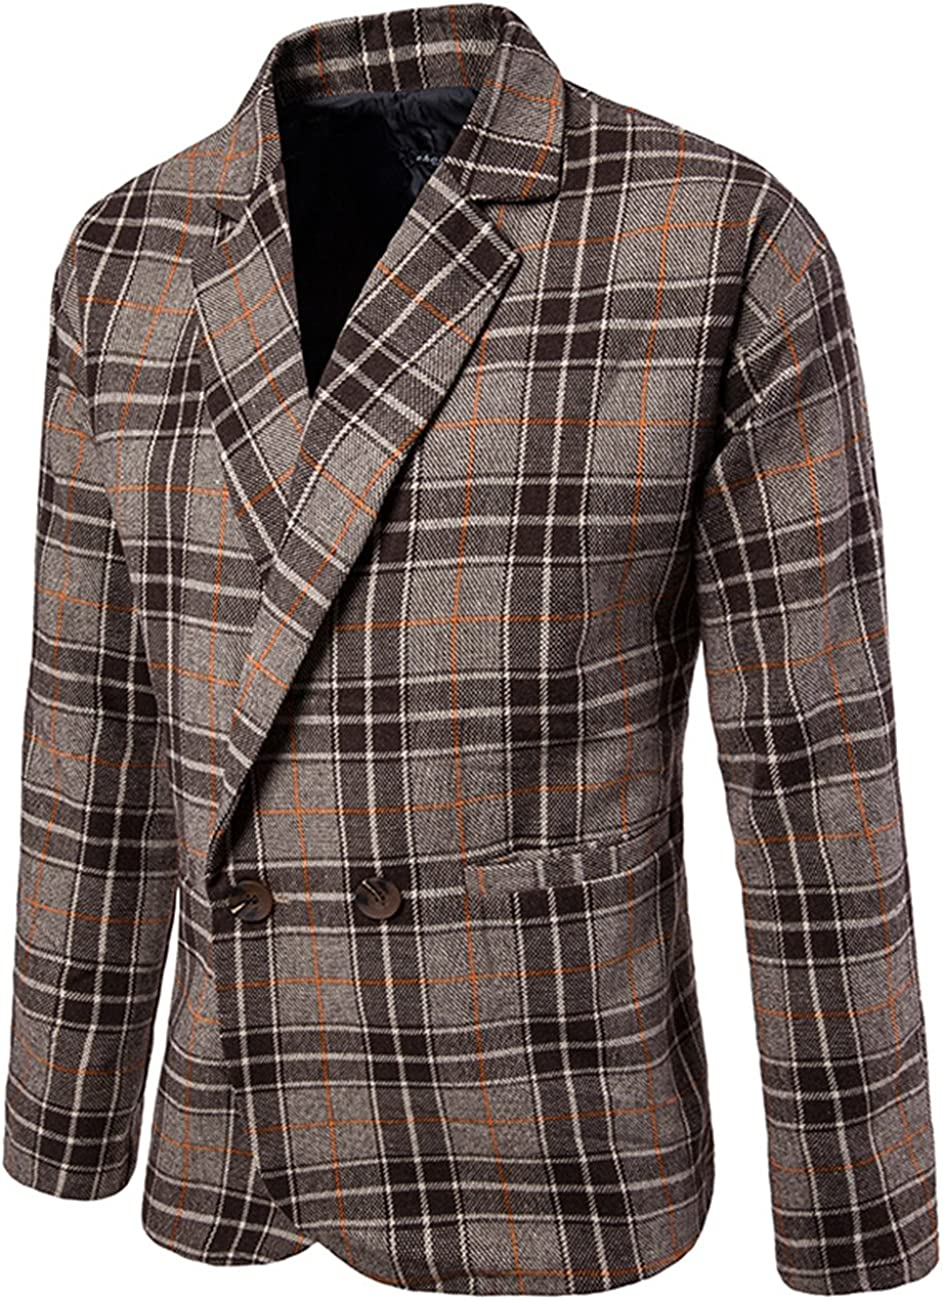 MiNi Men's Modern One Button Woolen Casual Fashion Jacket Blazer (Brown Grid,XS)